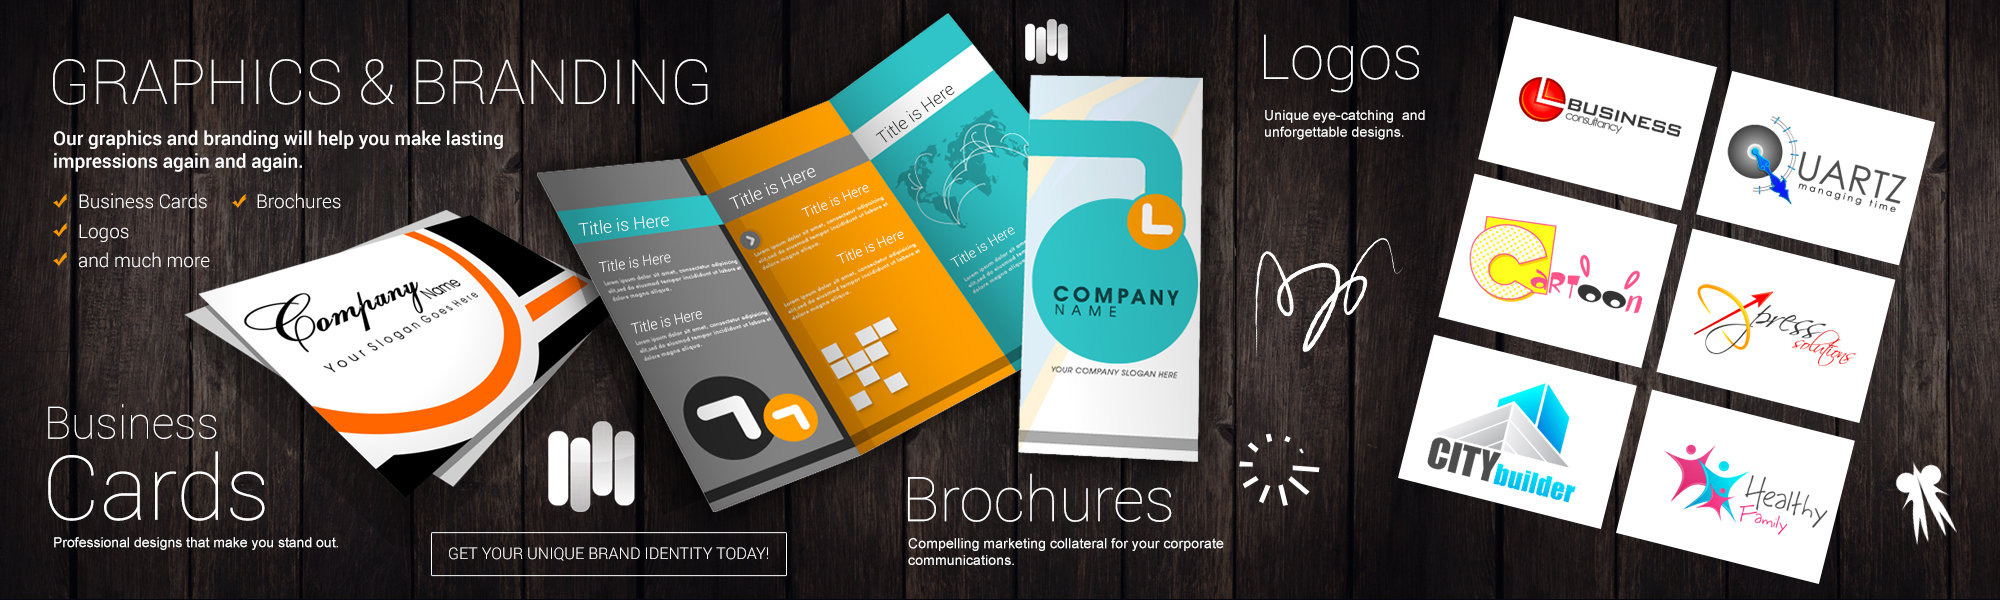 Graphics-Branding-02-1